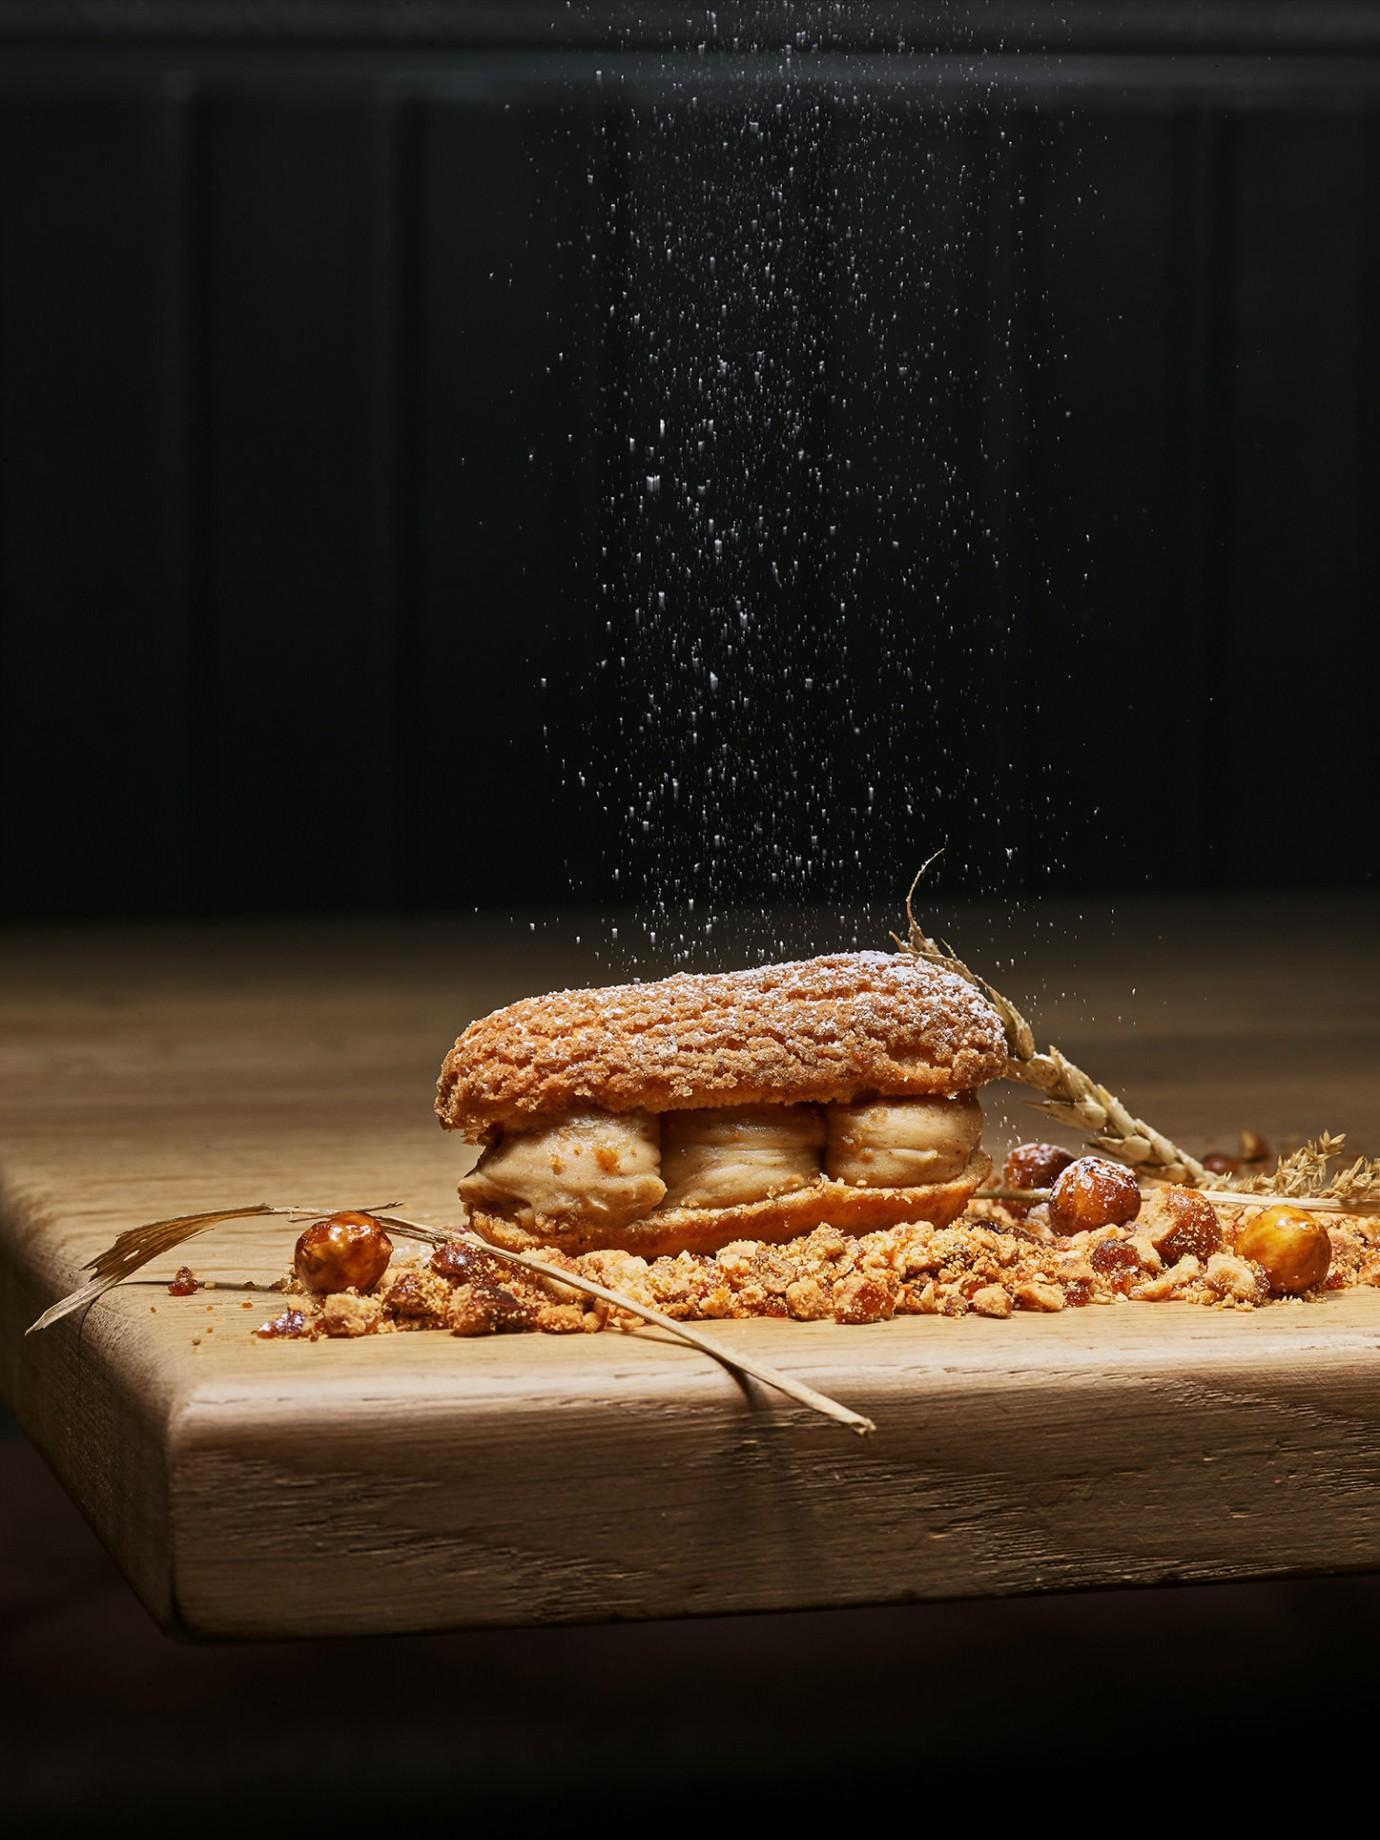 potes-au-feu_food_web-4